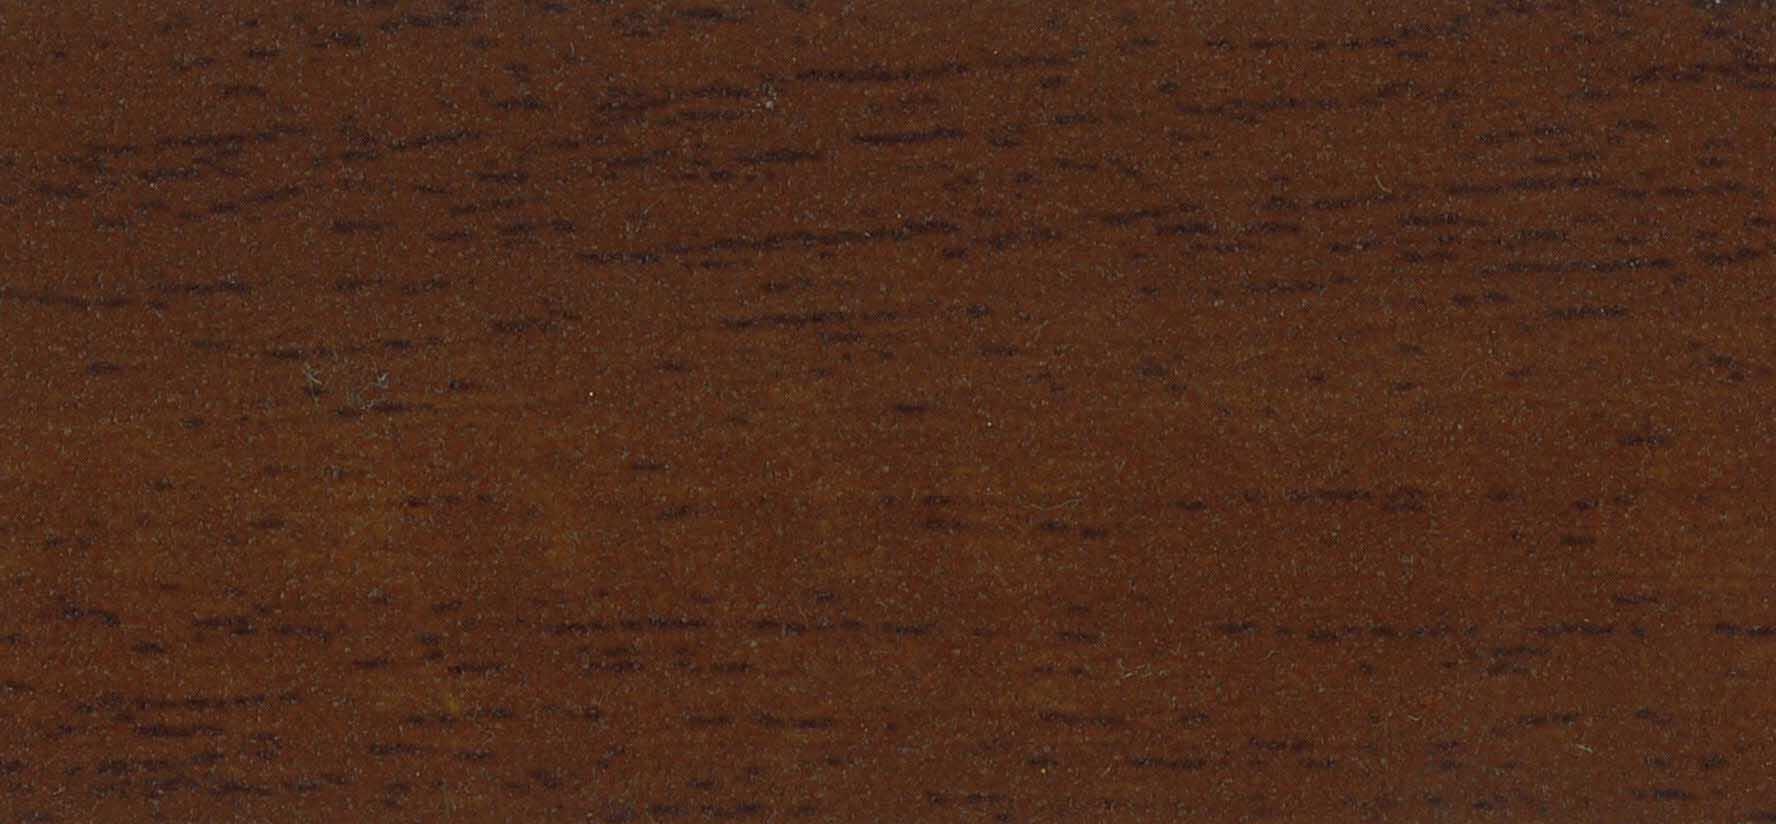 maderas sublimación S_002 - NOGAL OSCURO TEXTURADO